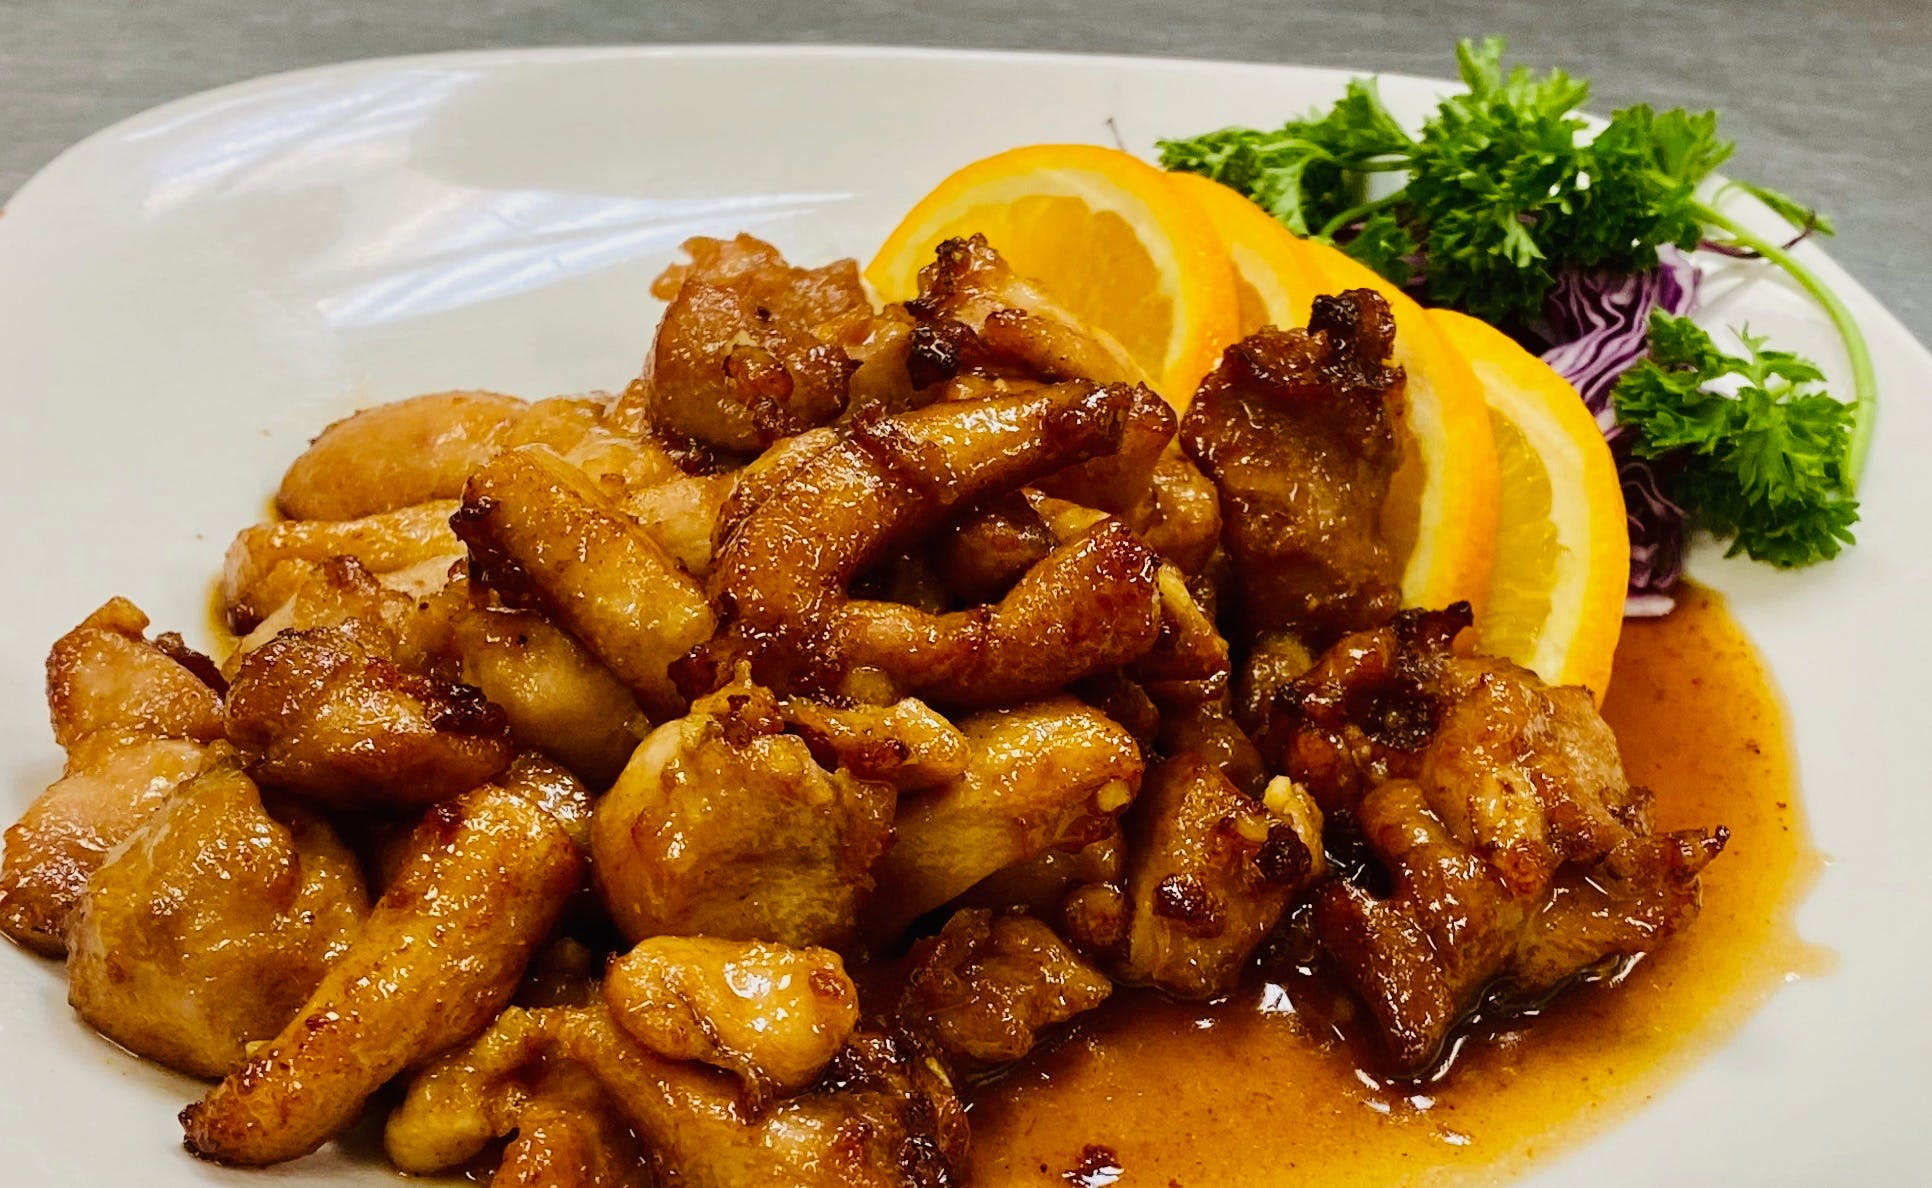 Bang Bang Chicken Entree from Stir Fry 88 in Green Bay, WI